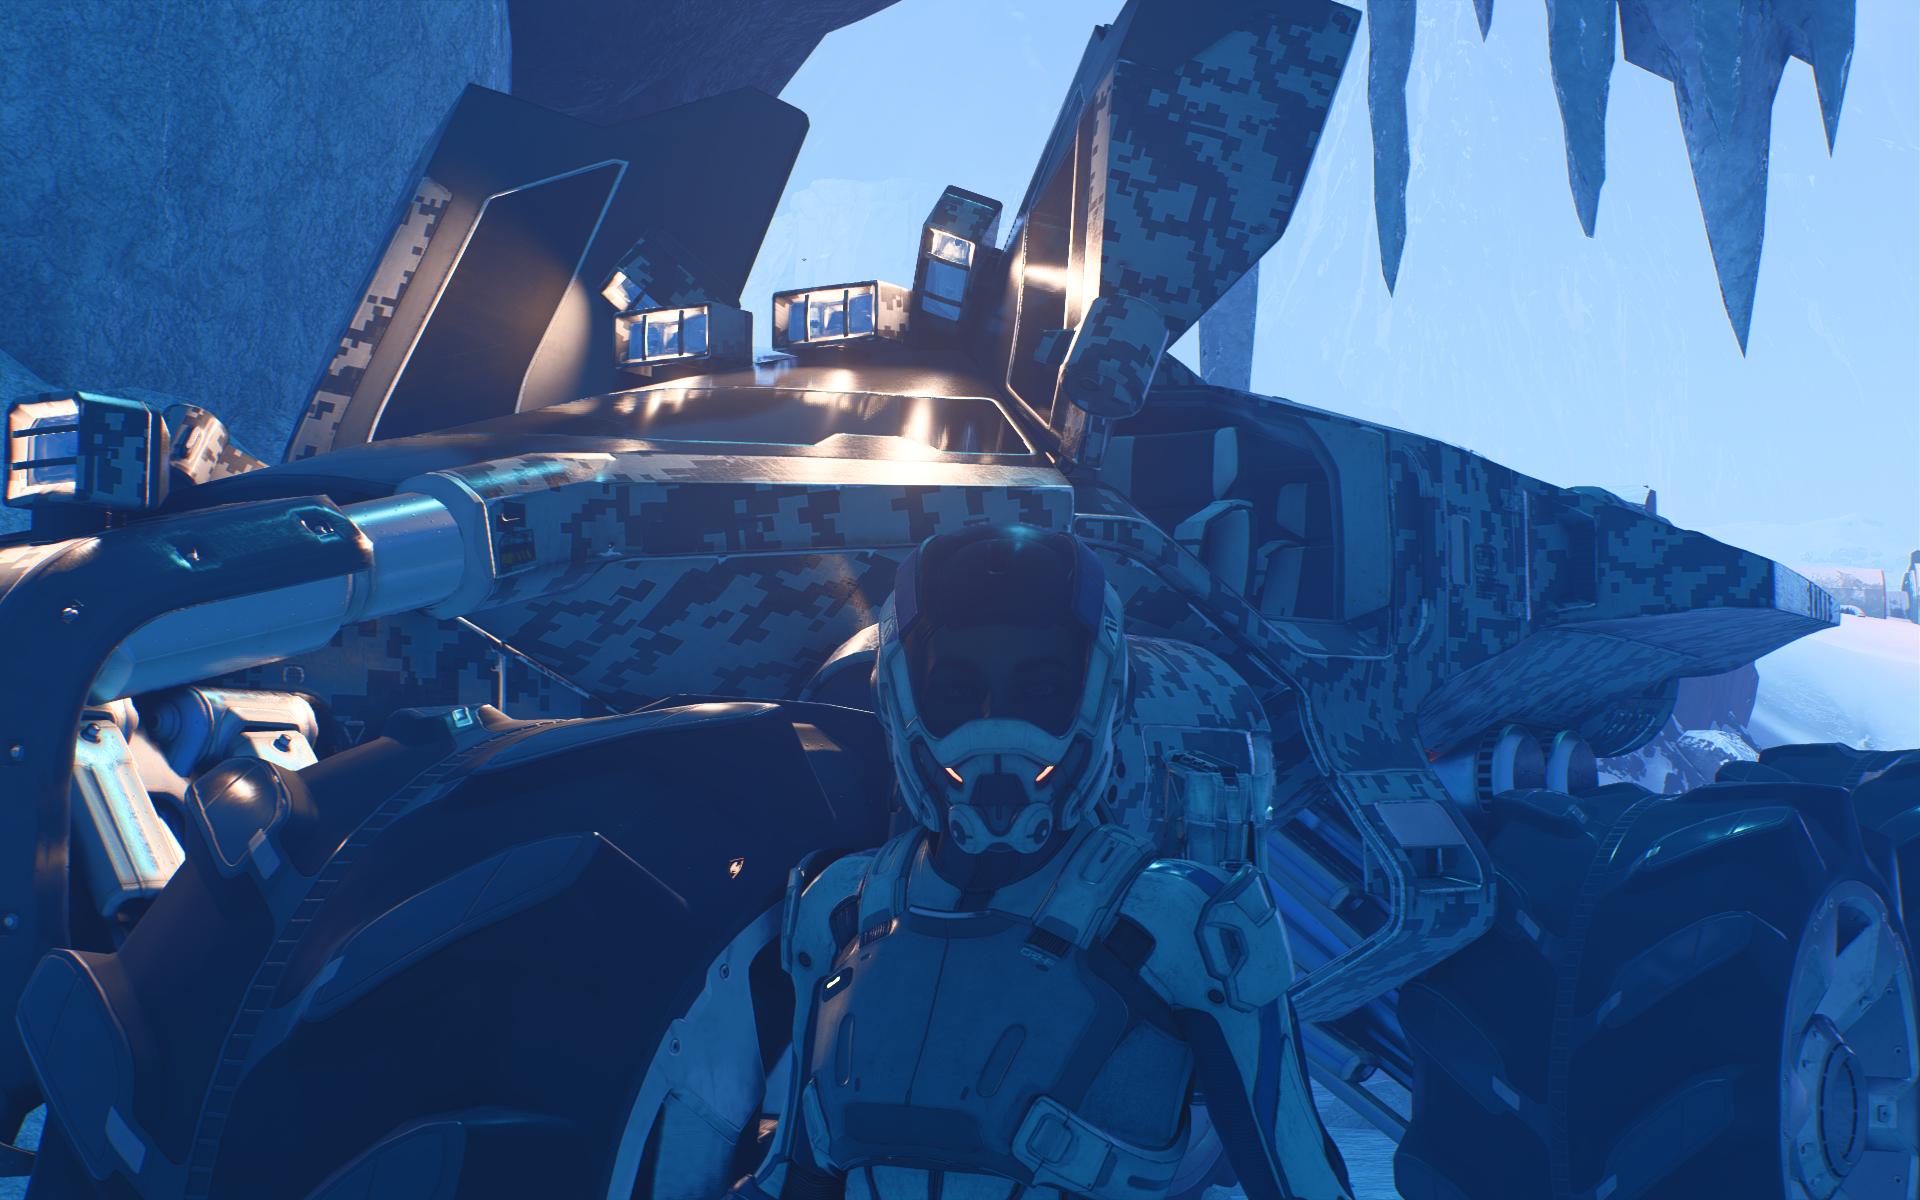 Mass Effect Andromeda Screenshot  - 00.20.19.19.png - Mass Effect: Andromeda